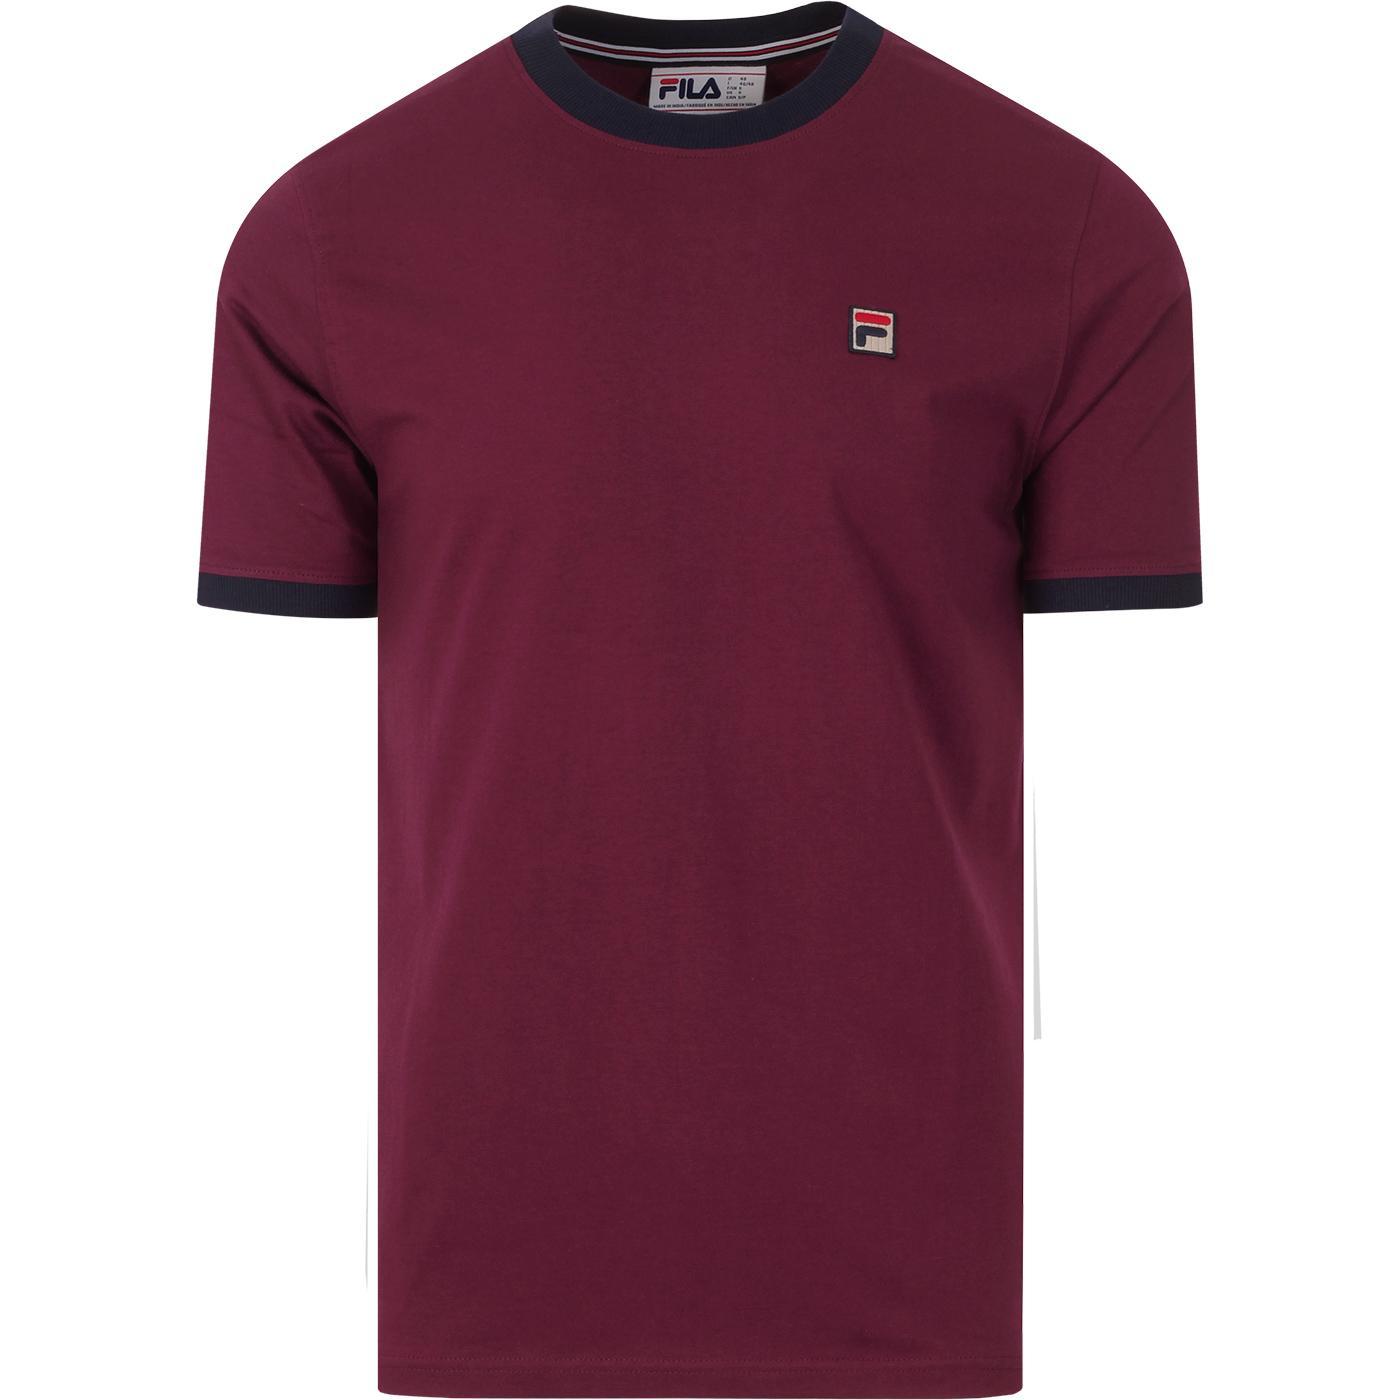 Marconi FILA VINTAGE Retro 70s Ringer T-shirt P/P